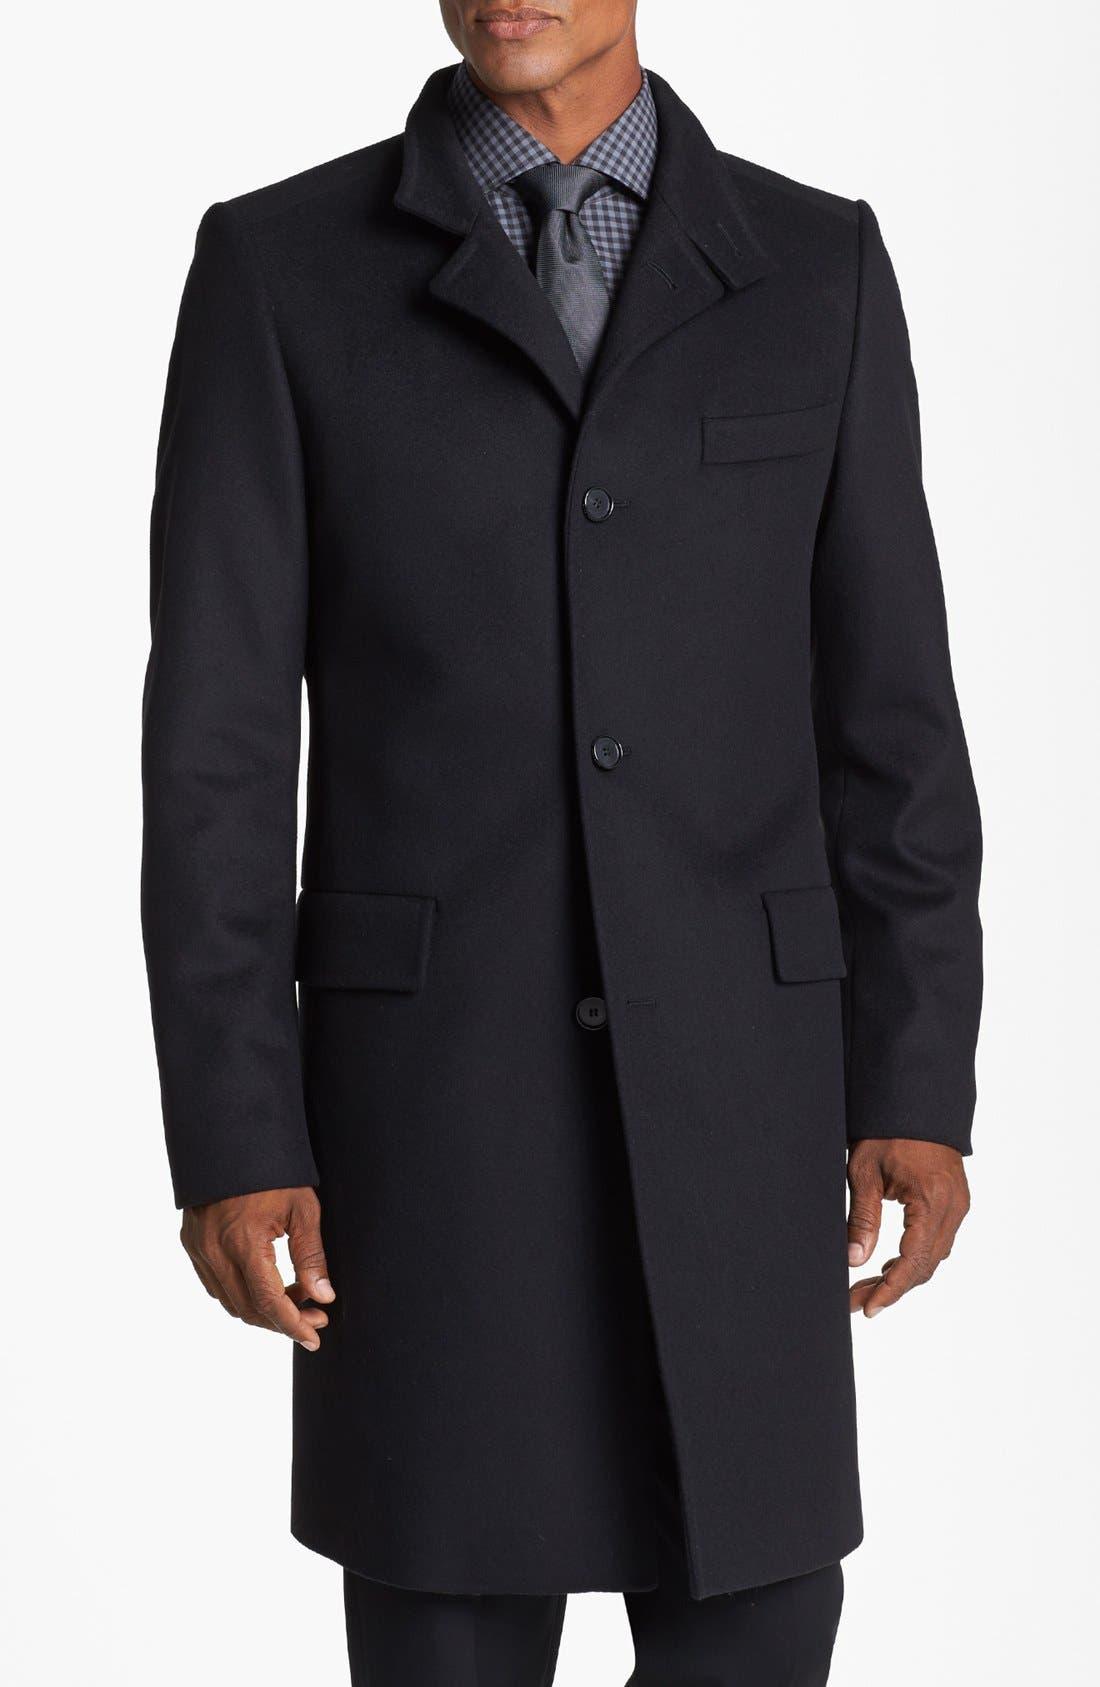 BOSS HUGO BOSS 'Sintrax' Wool Blend Coat,                             Alternate thumbnail 2, color,                             001